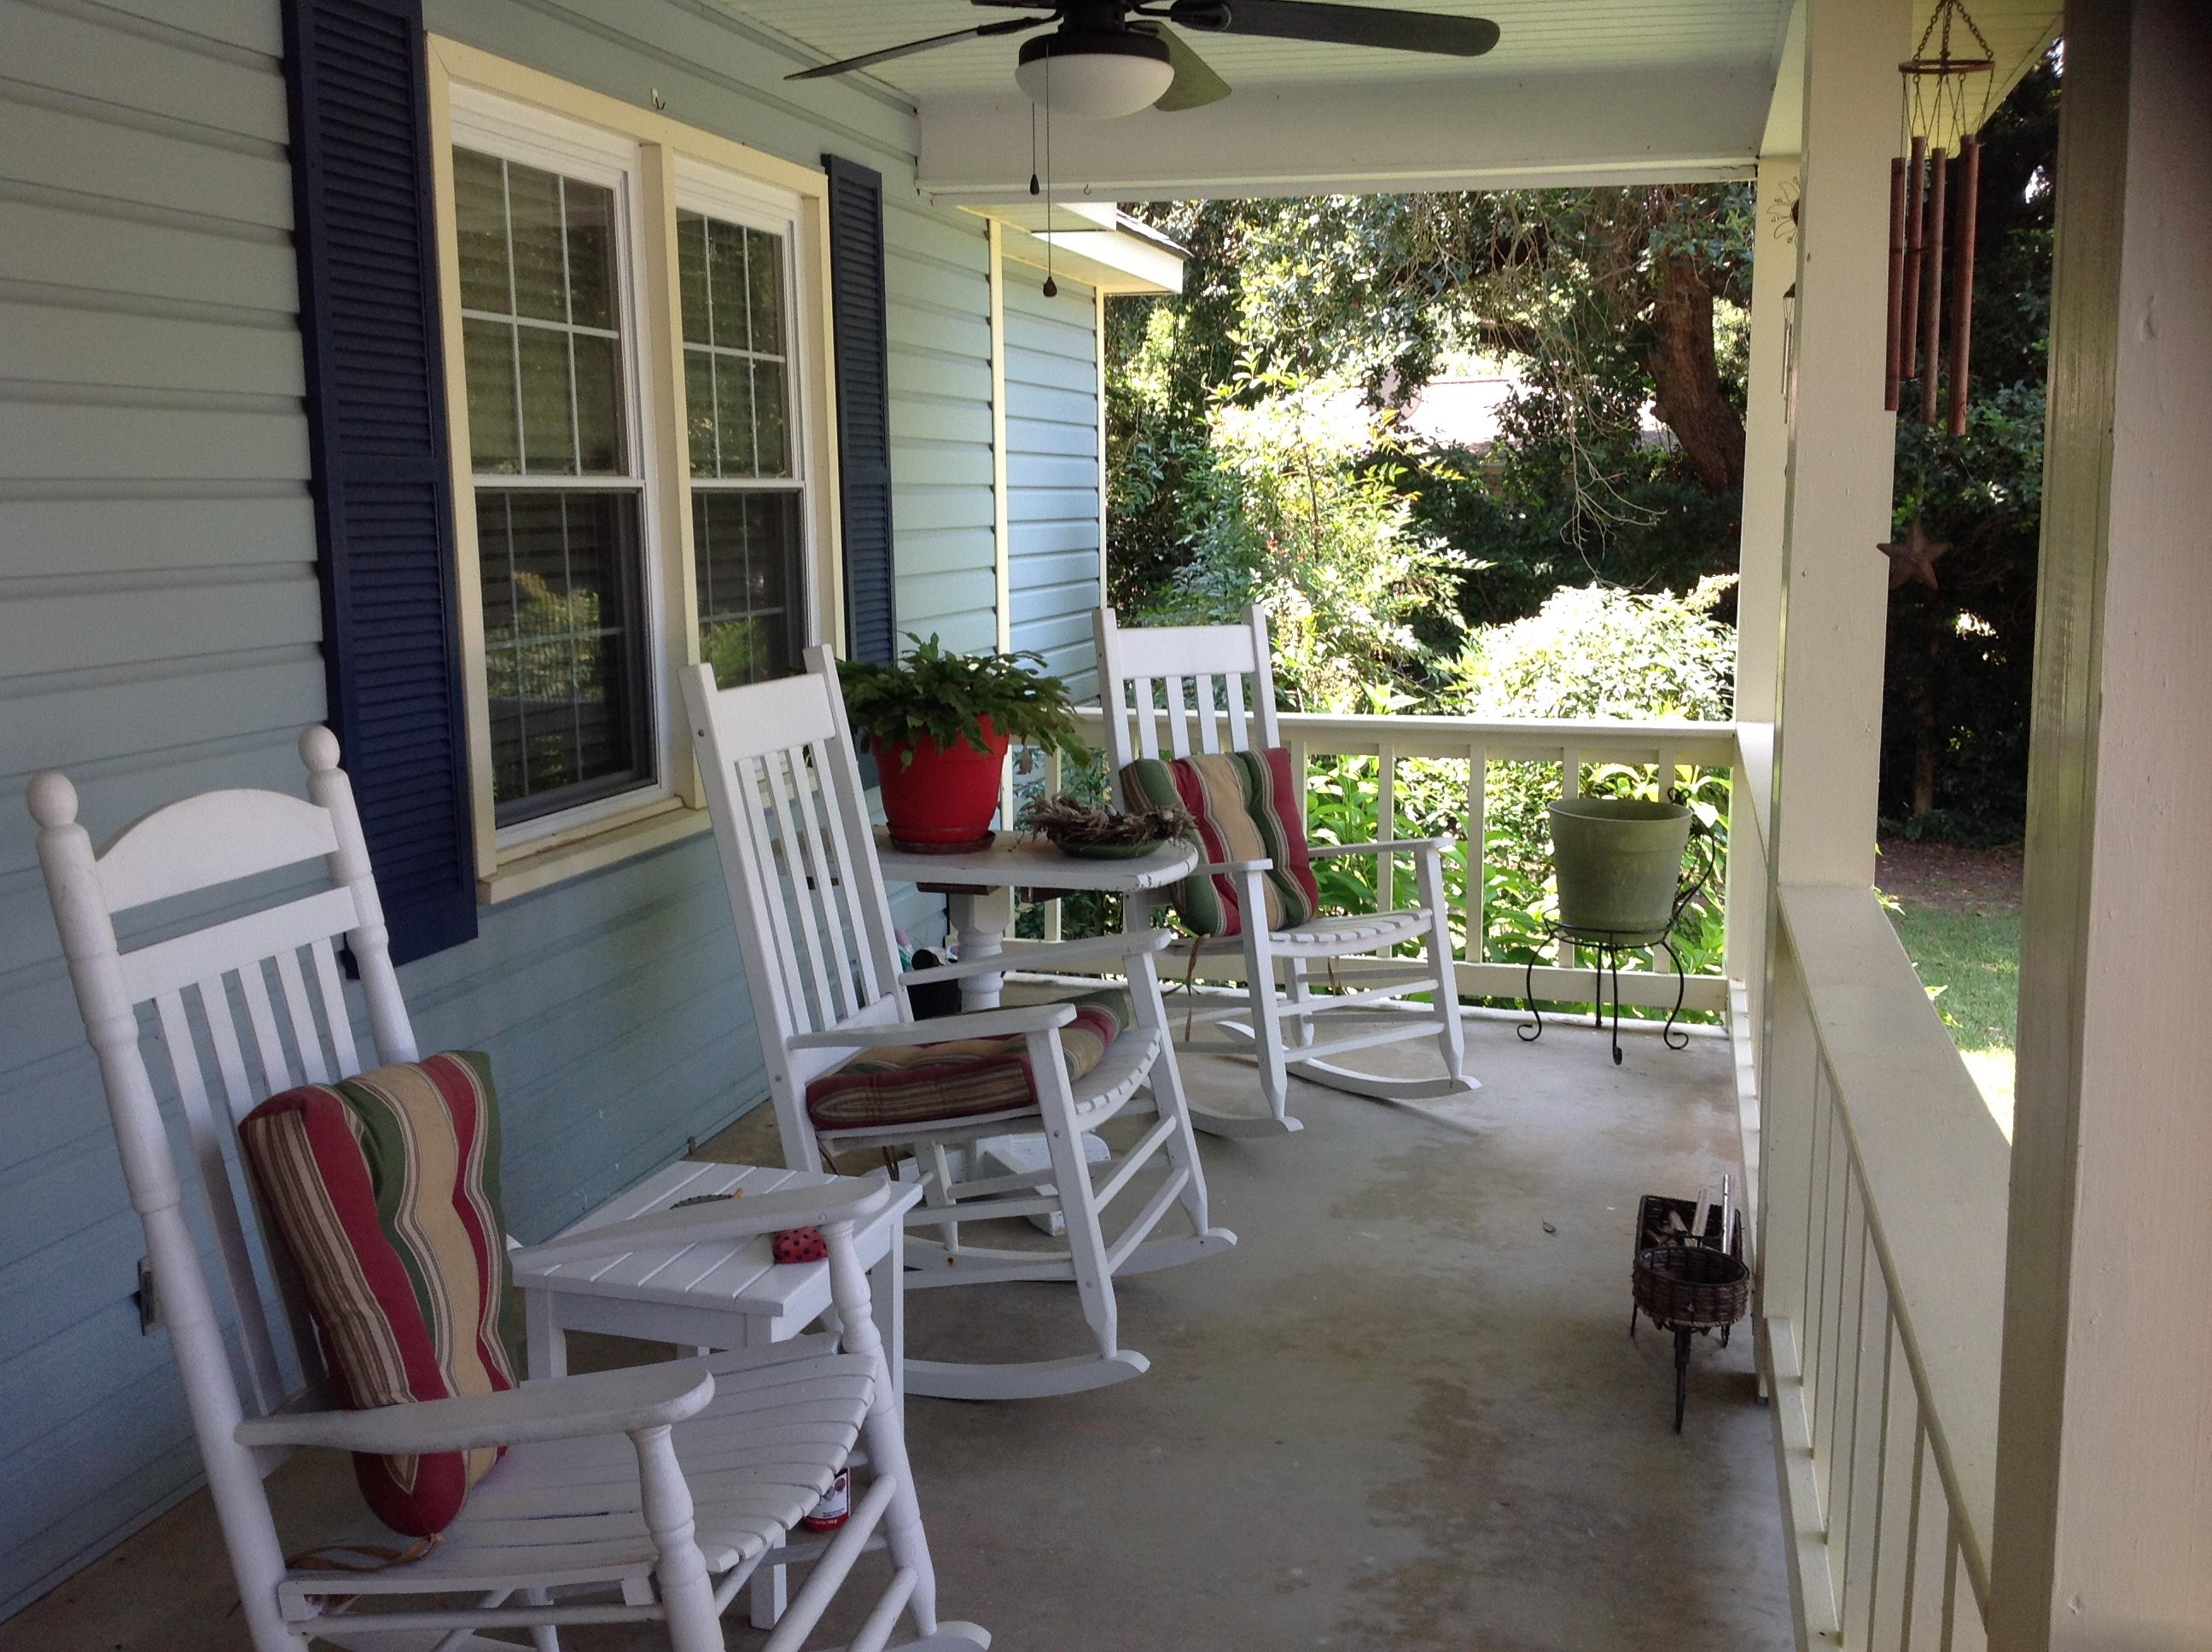 Belvedere II Homes For Sale - 122 Dogwood, Eutawville, SC - 16